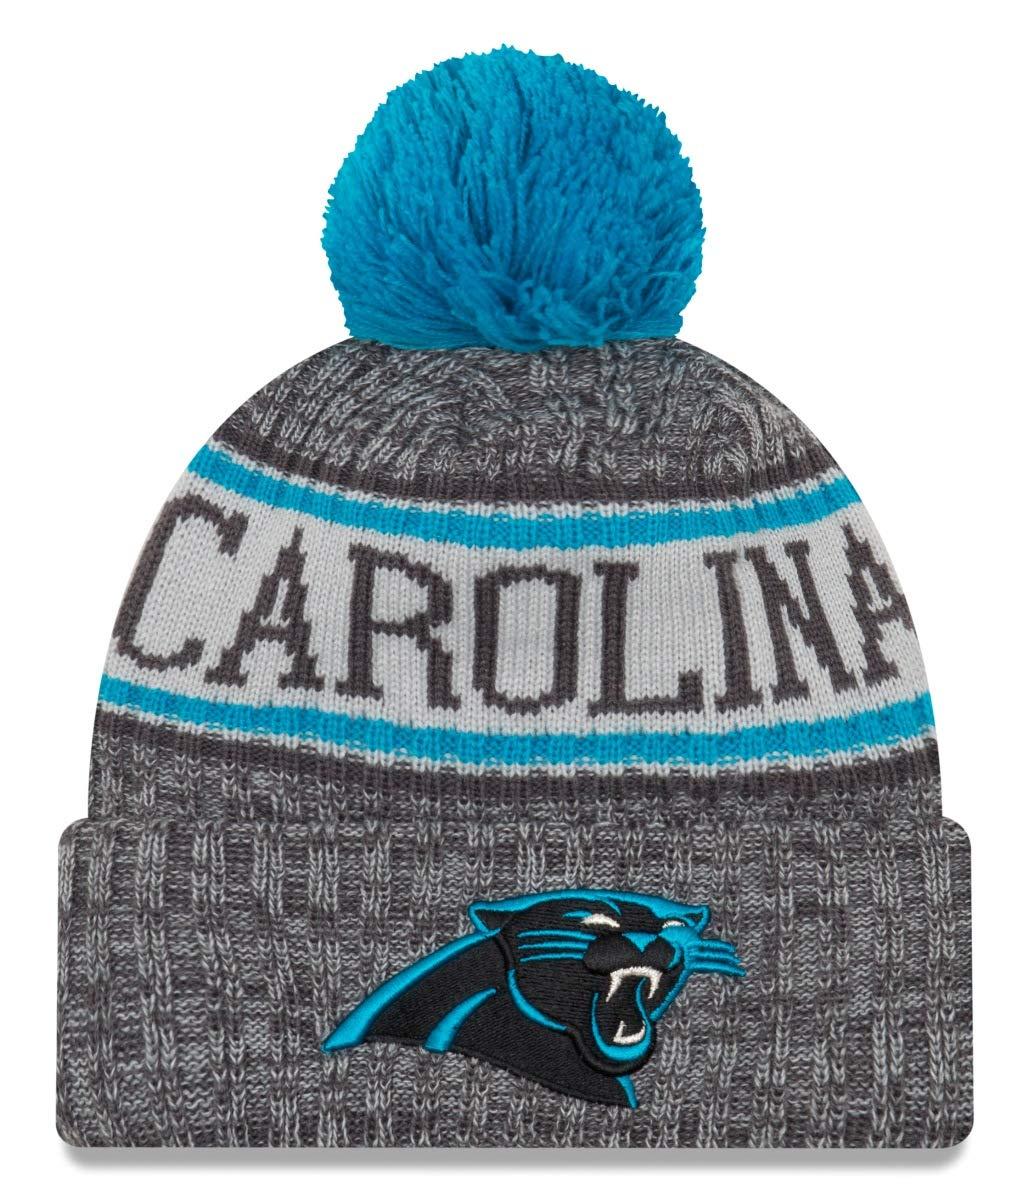 82be9c95 New Era Carolina Panthers Gray/Graphite Sport Knit NFL 2018 Beanie Unisex  Hat Graphite, OSFM